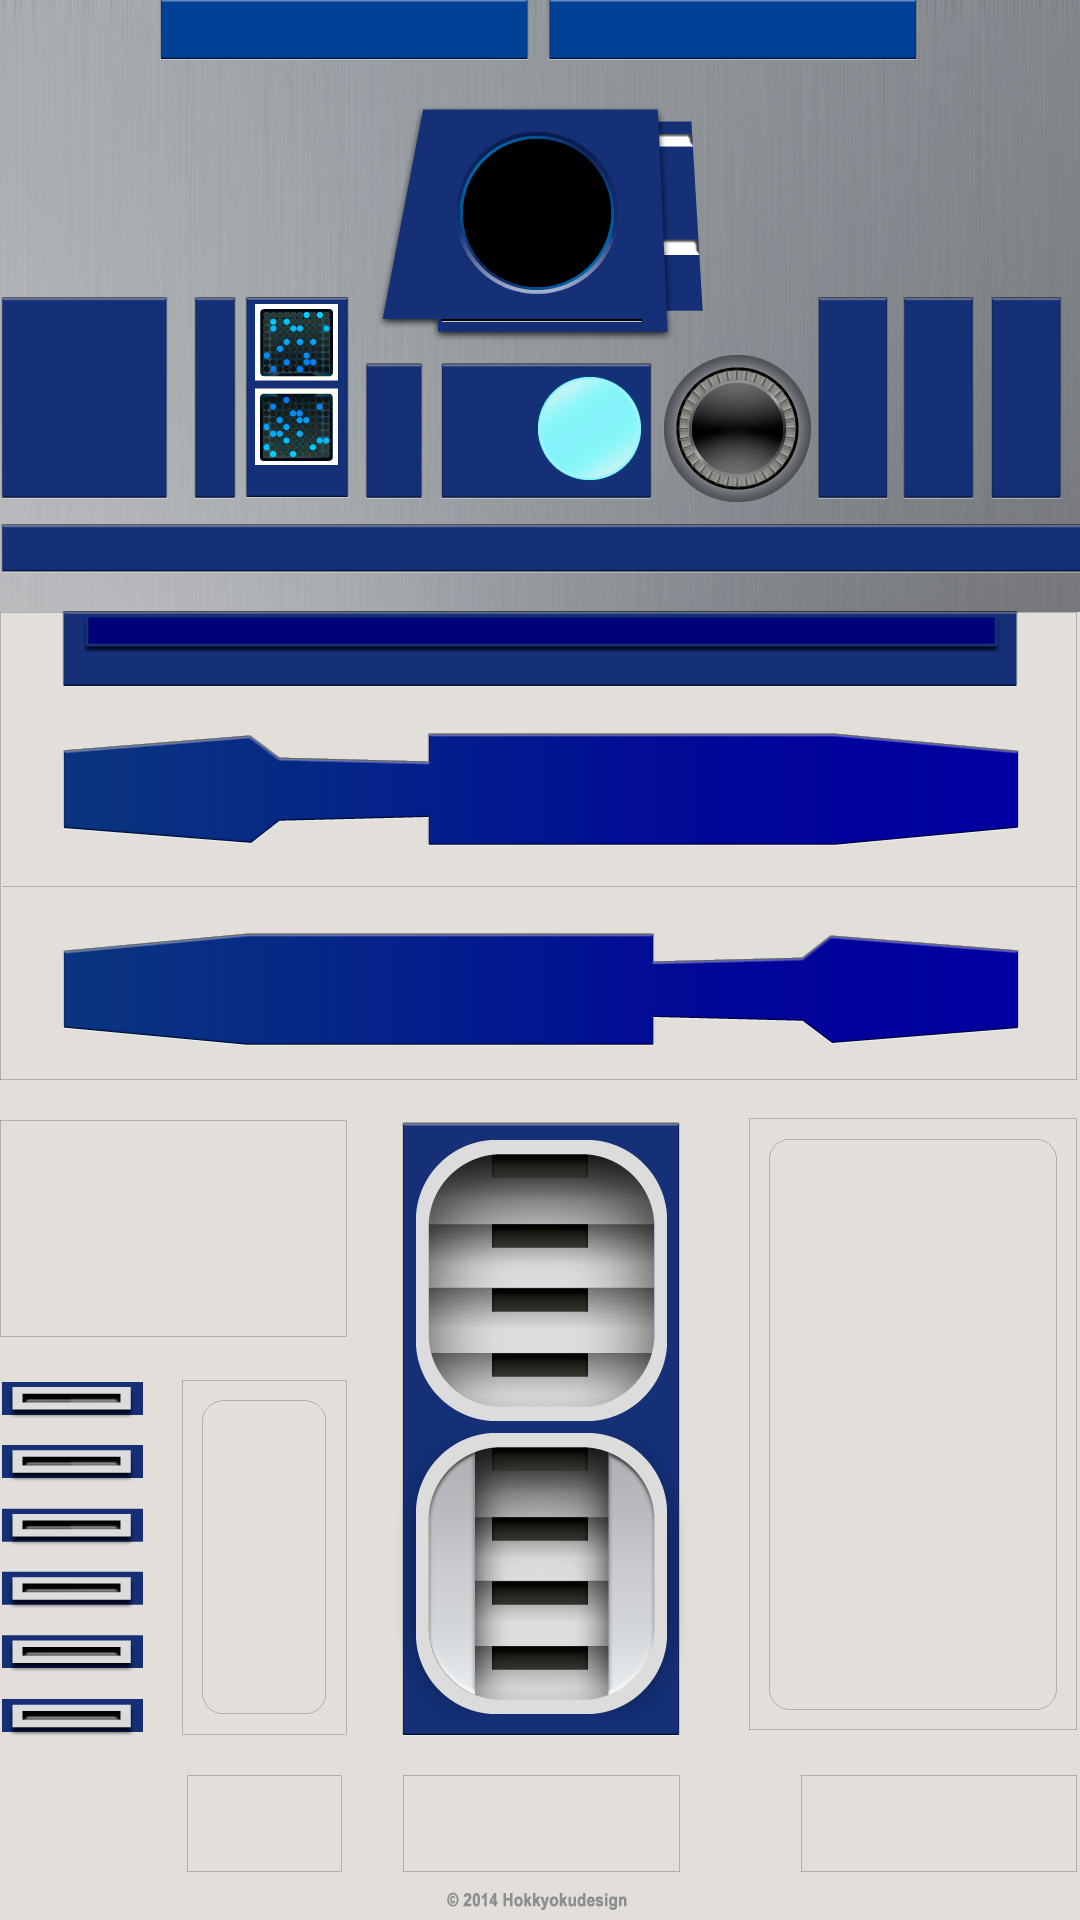 R2D2 Star Wars wallpaper スターウォーズのポスター, スターウォーズ壁紙iphone